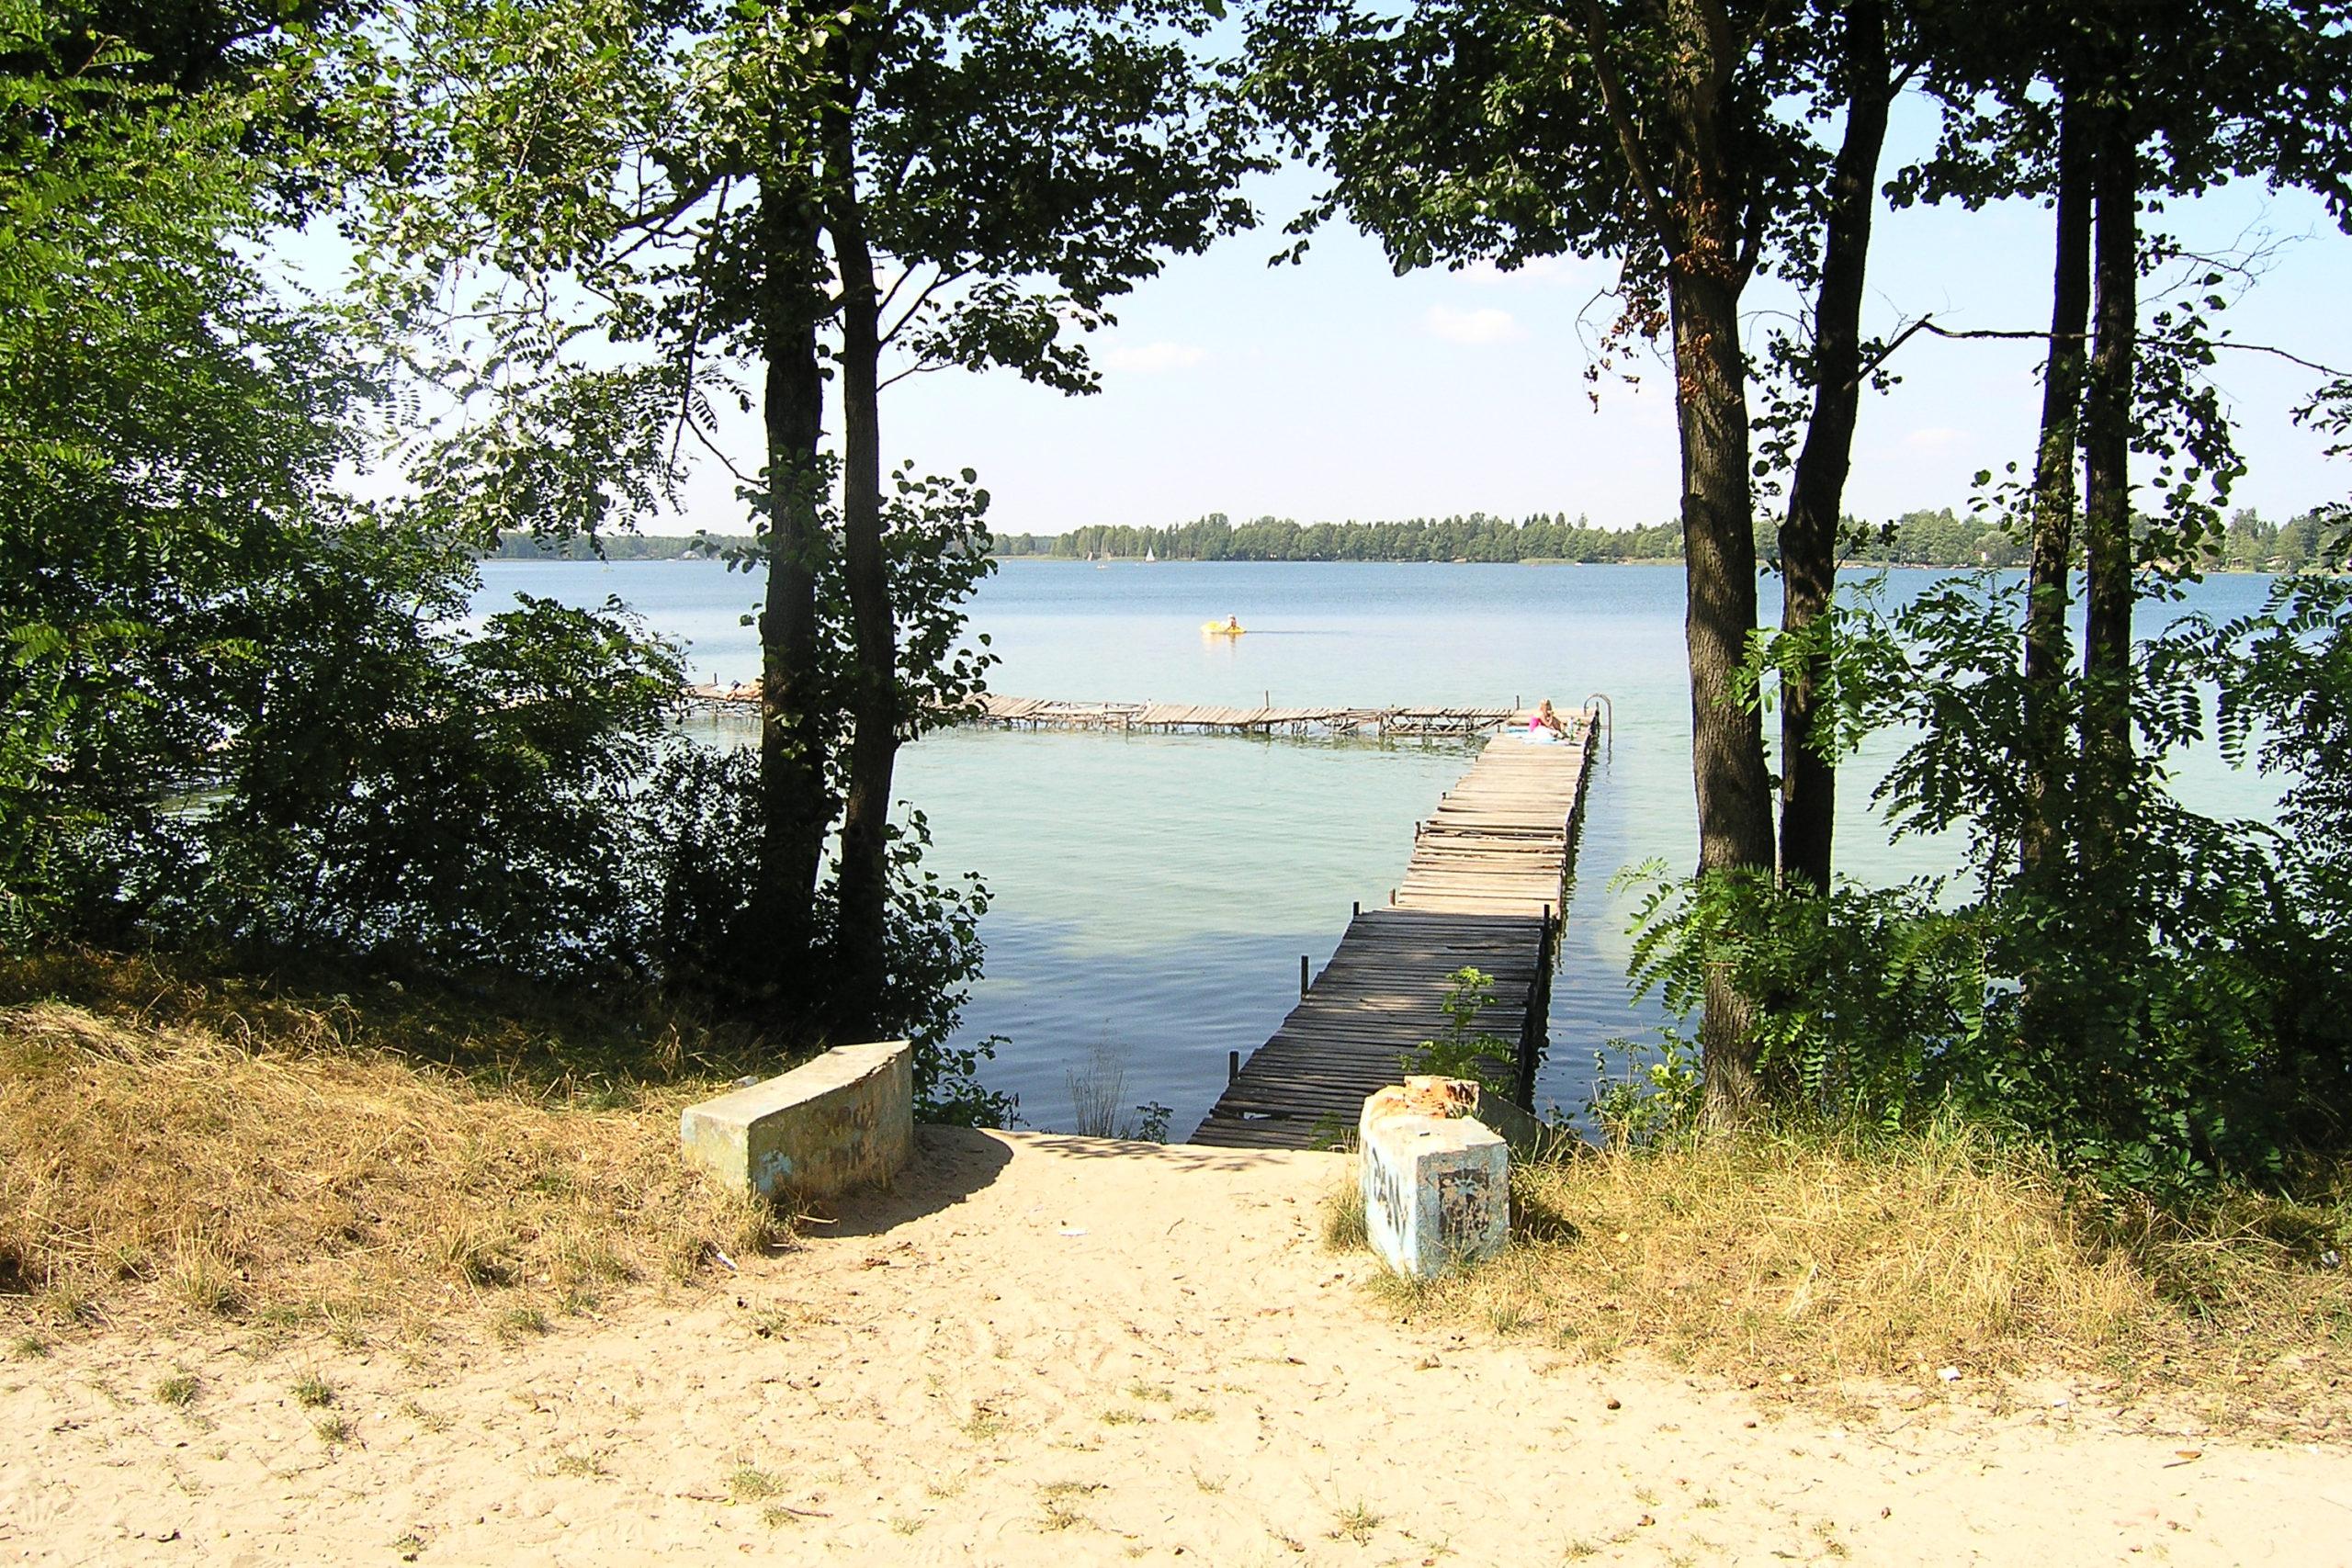 okuninka widok na molo i jezioro